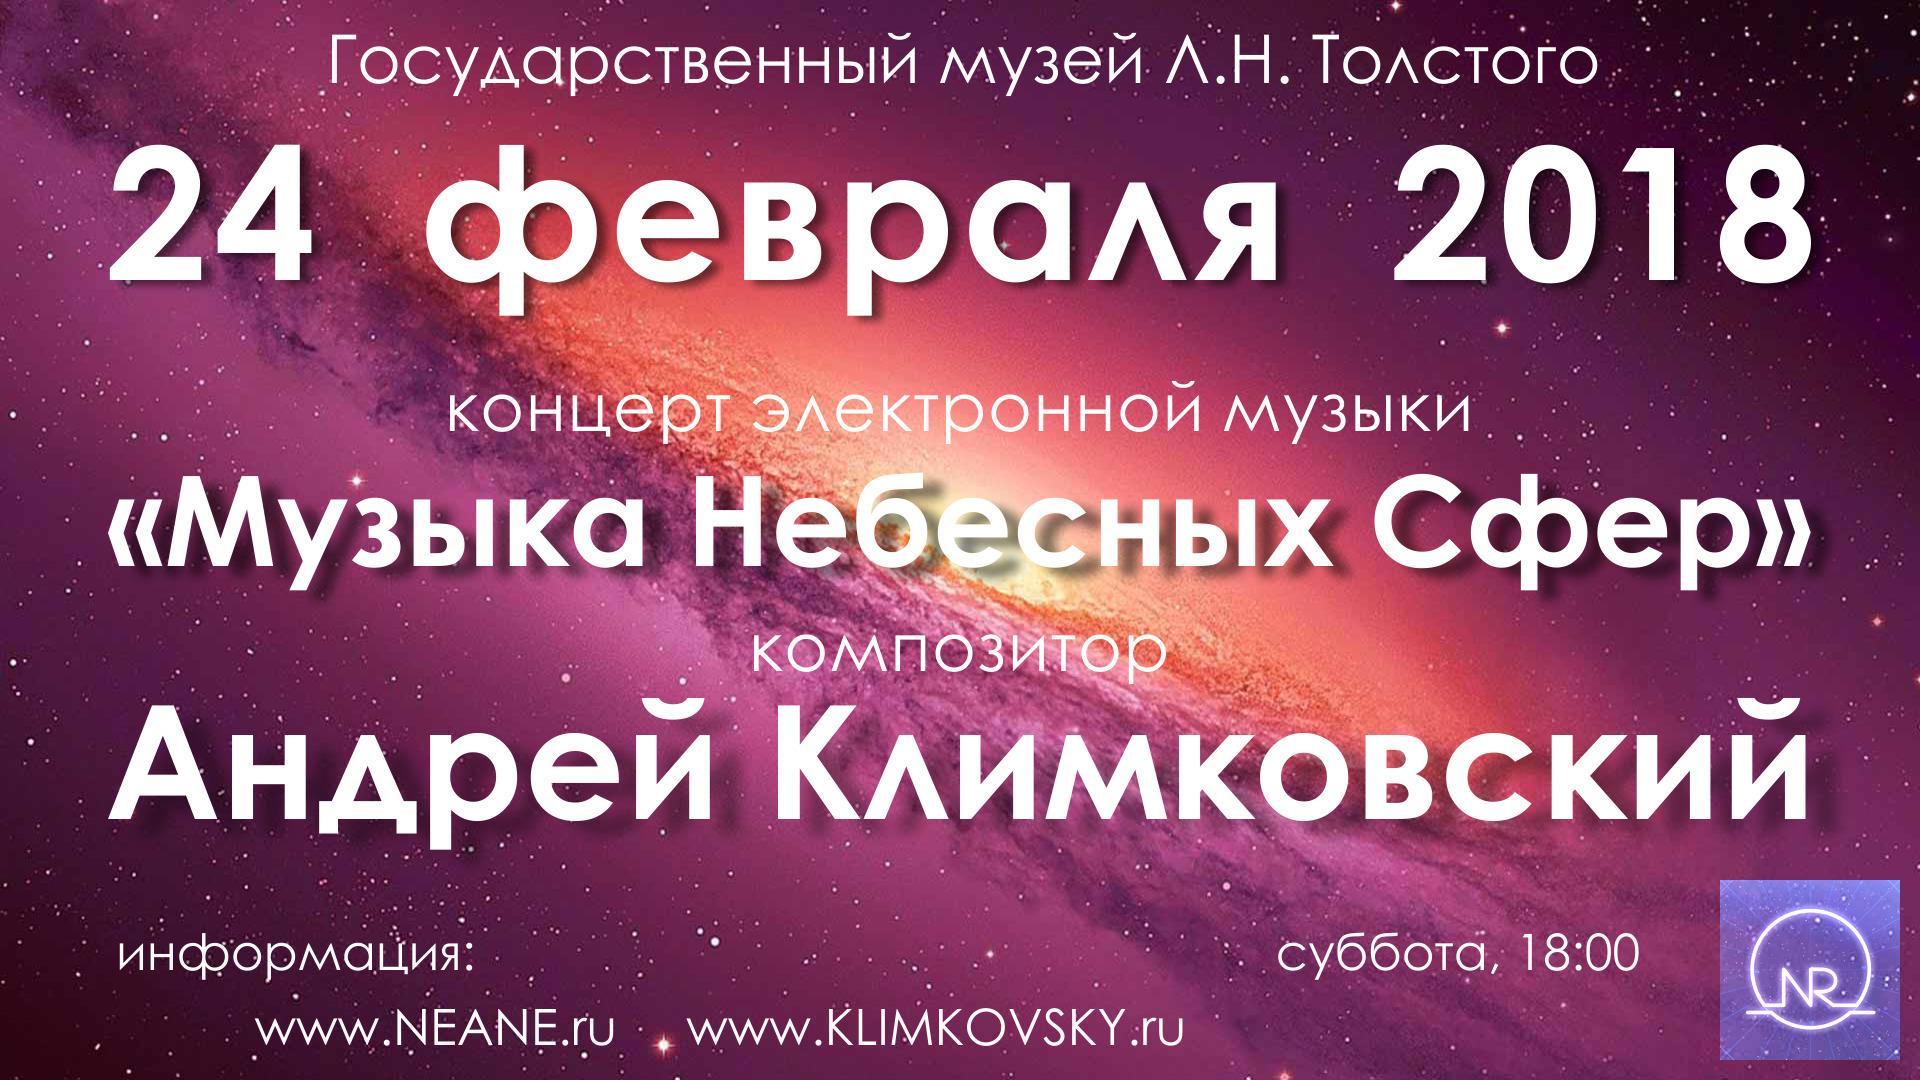 24 февраля 2018 года концерт «М - andreyklimkovsky   ello